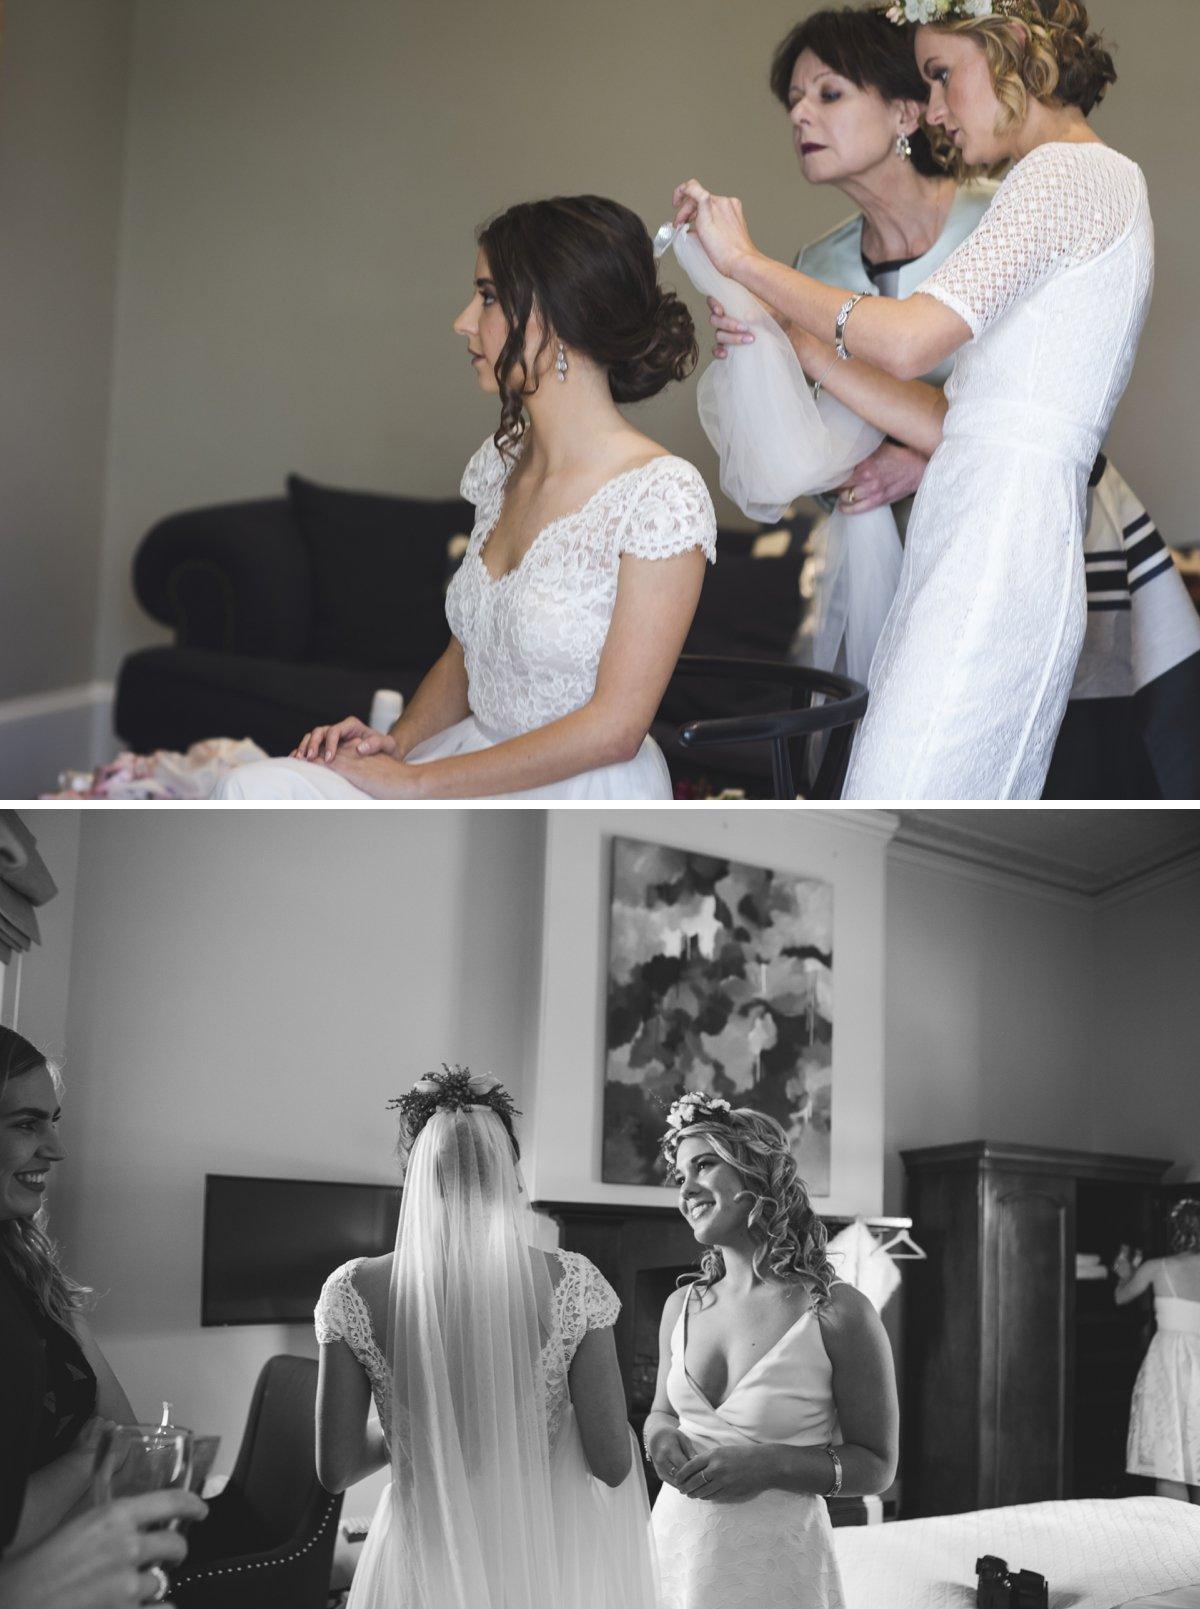 wedding photography at the Houston Wagga Wagga Fox n Co Hotel3